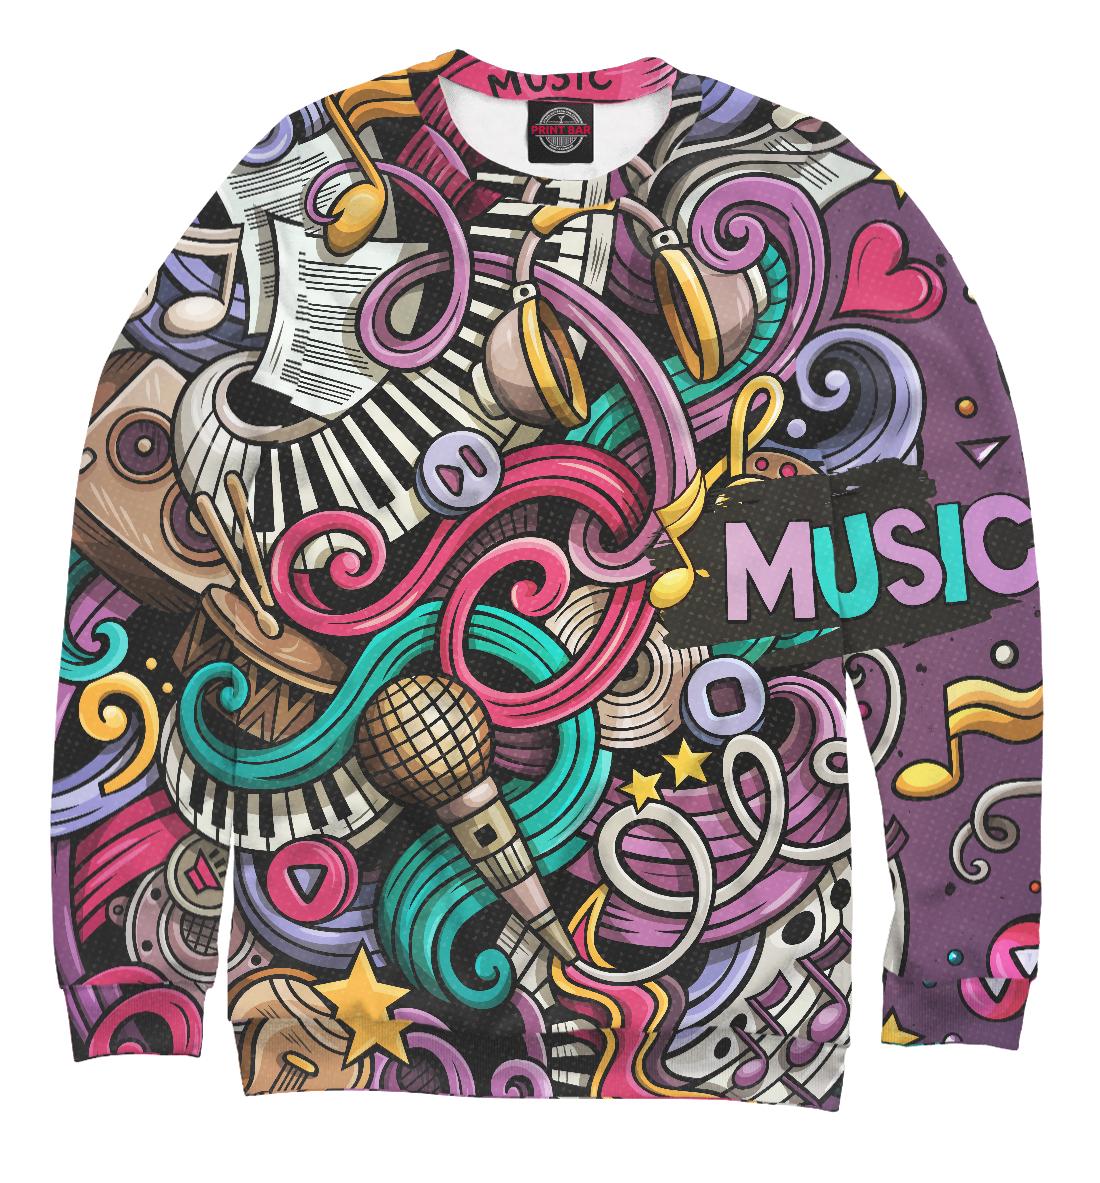 Музыкальный коллаж